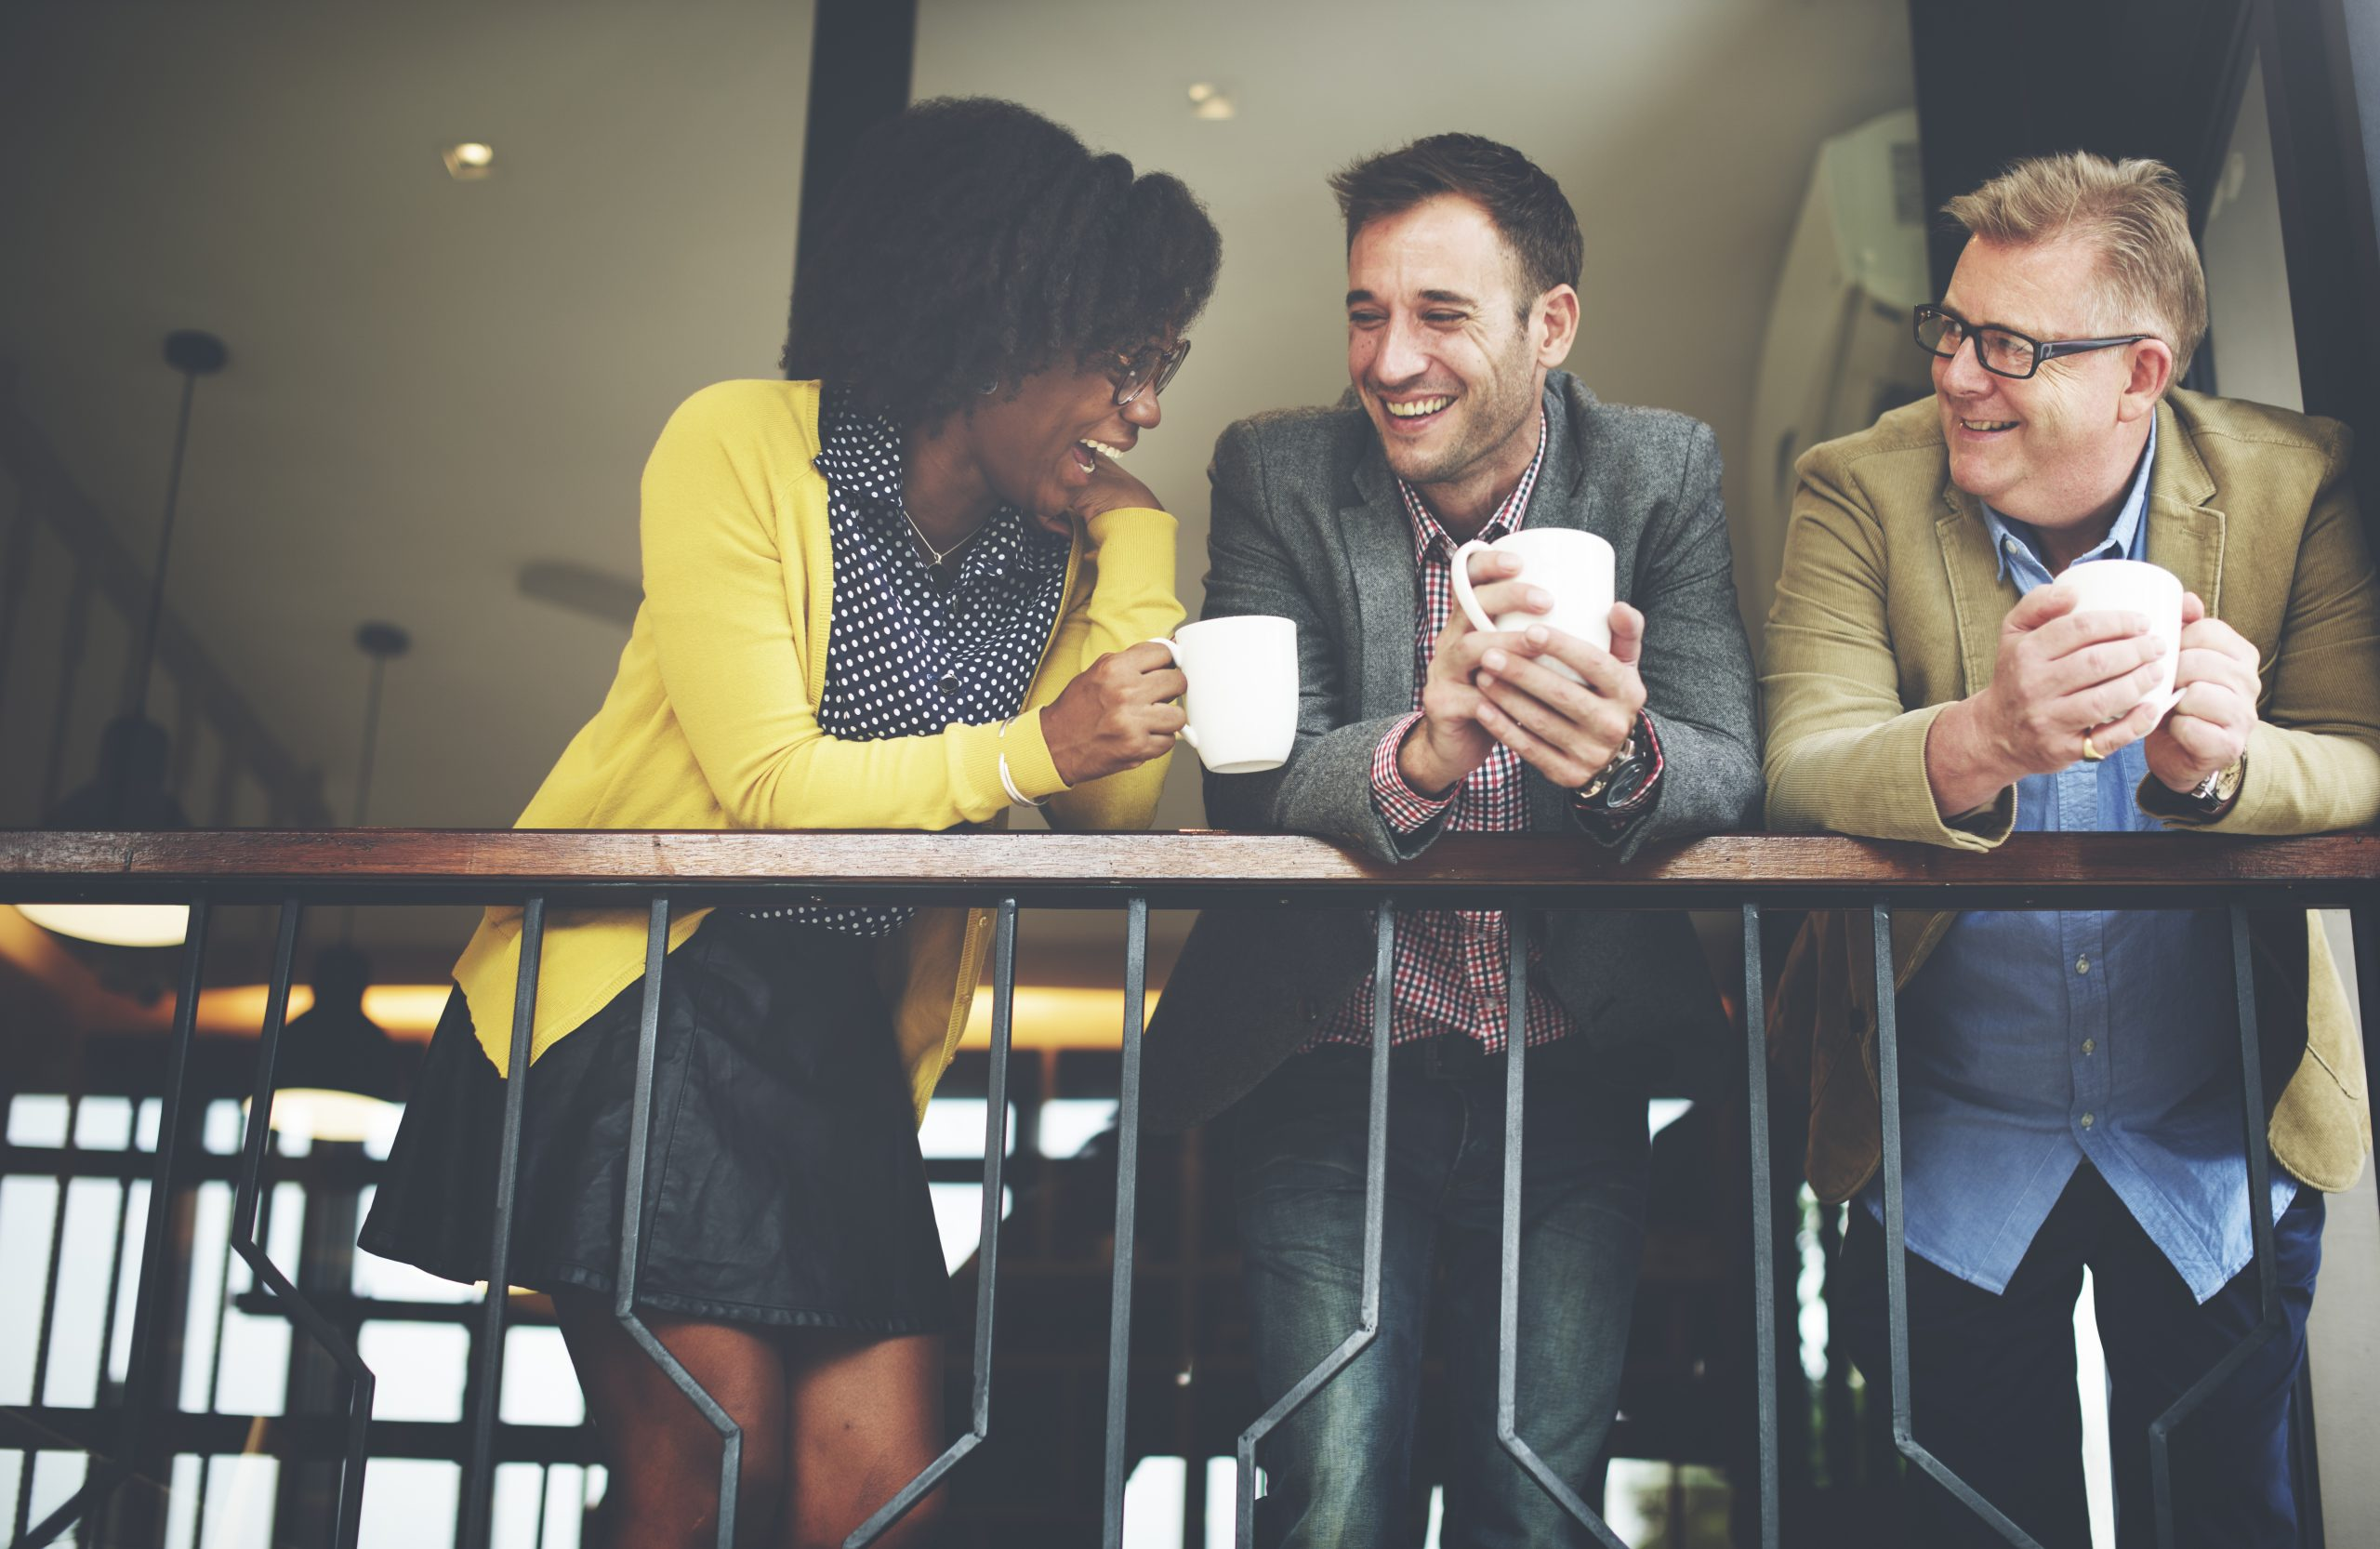 Entrepreneurs meeting for coffee